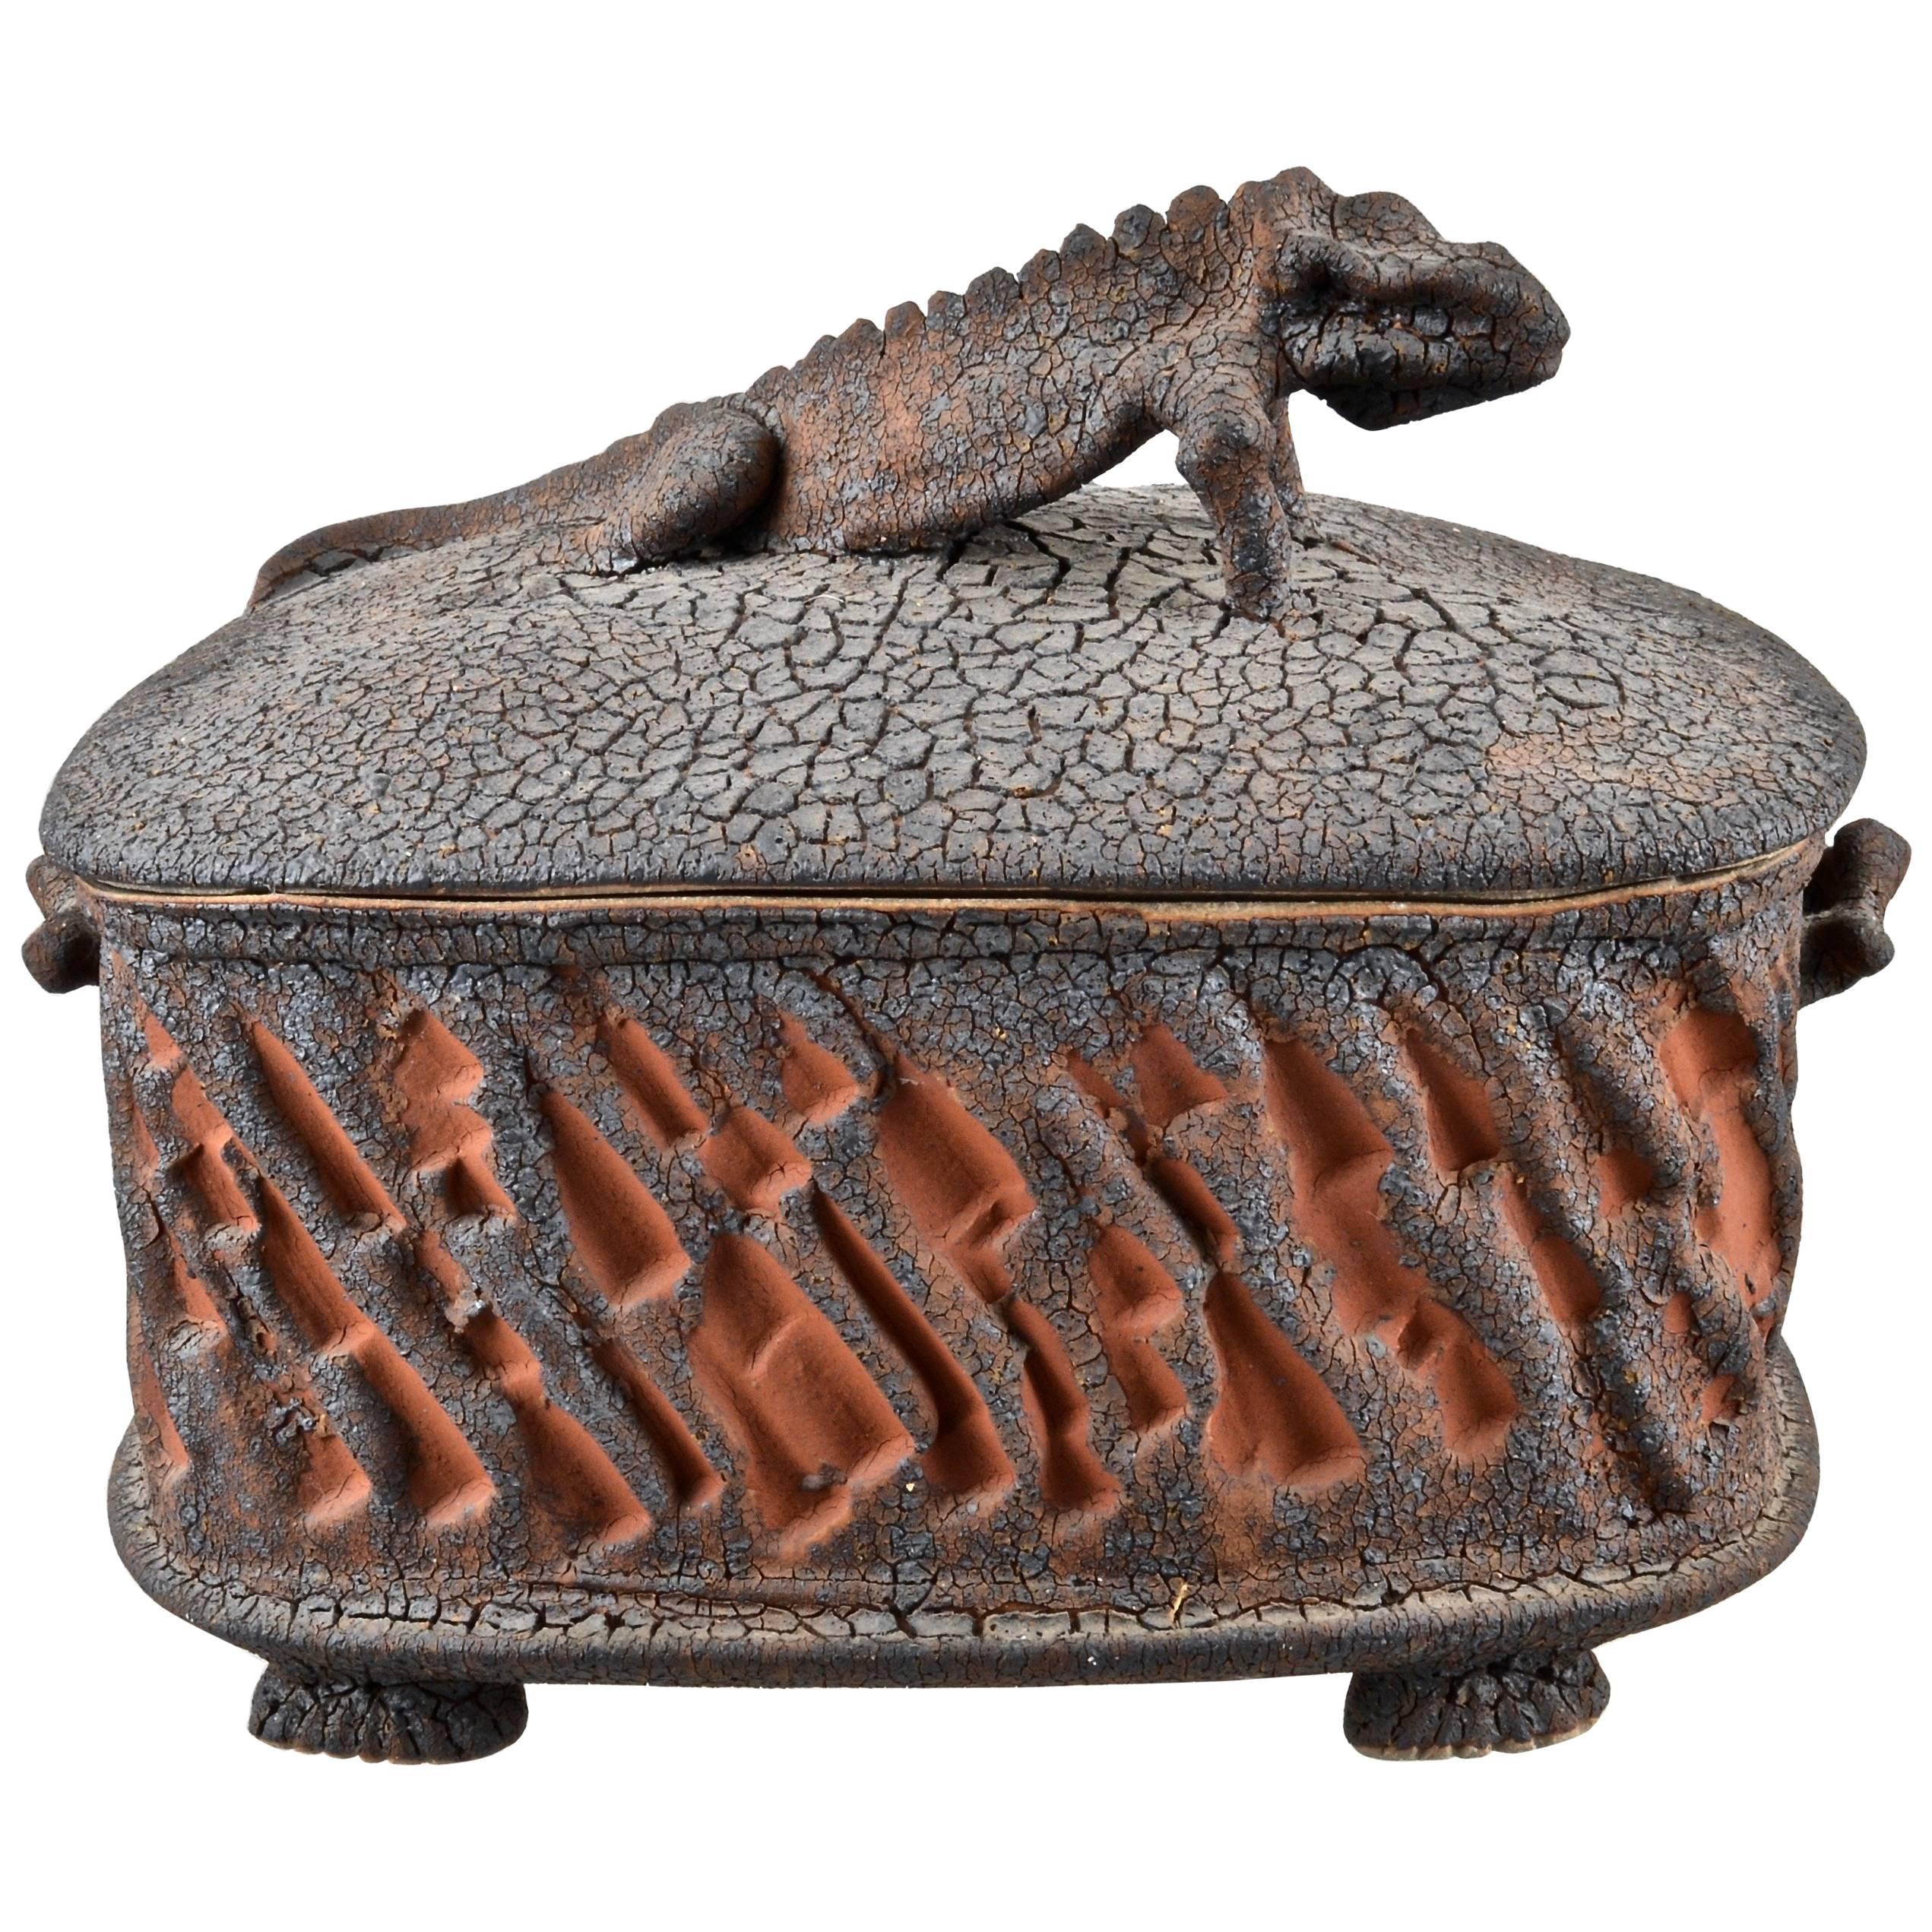 Charles Gluskoter Art Pottery Lidded Box, USA, 1987